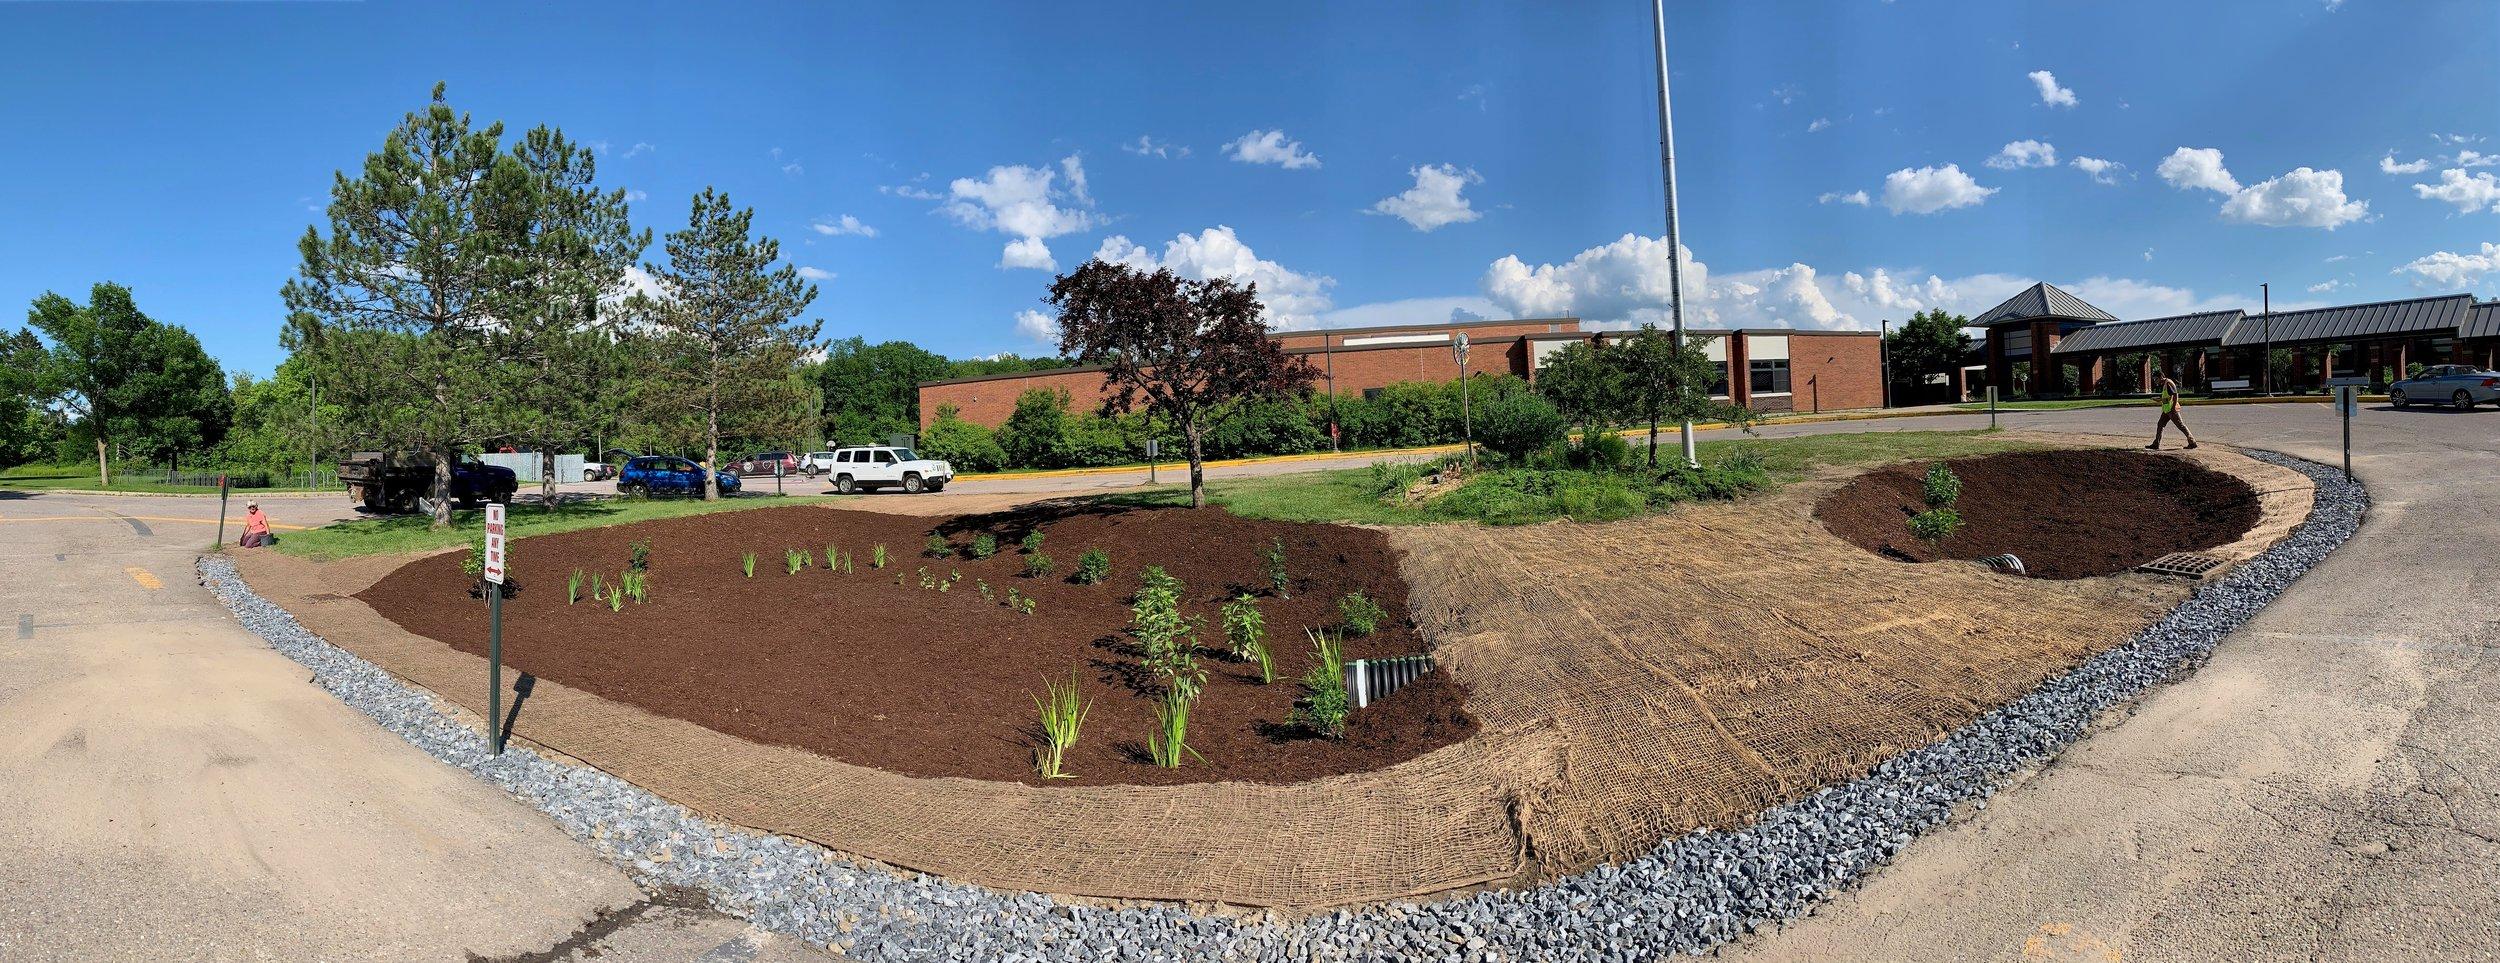 The completed Shelburne Community School rain garden